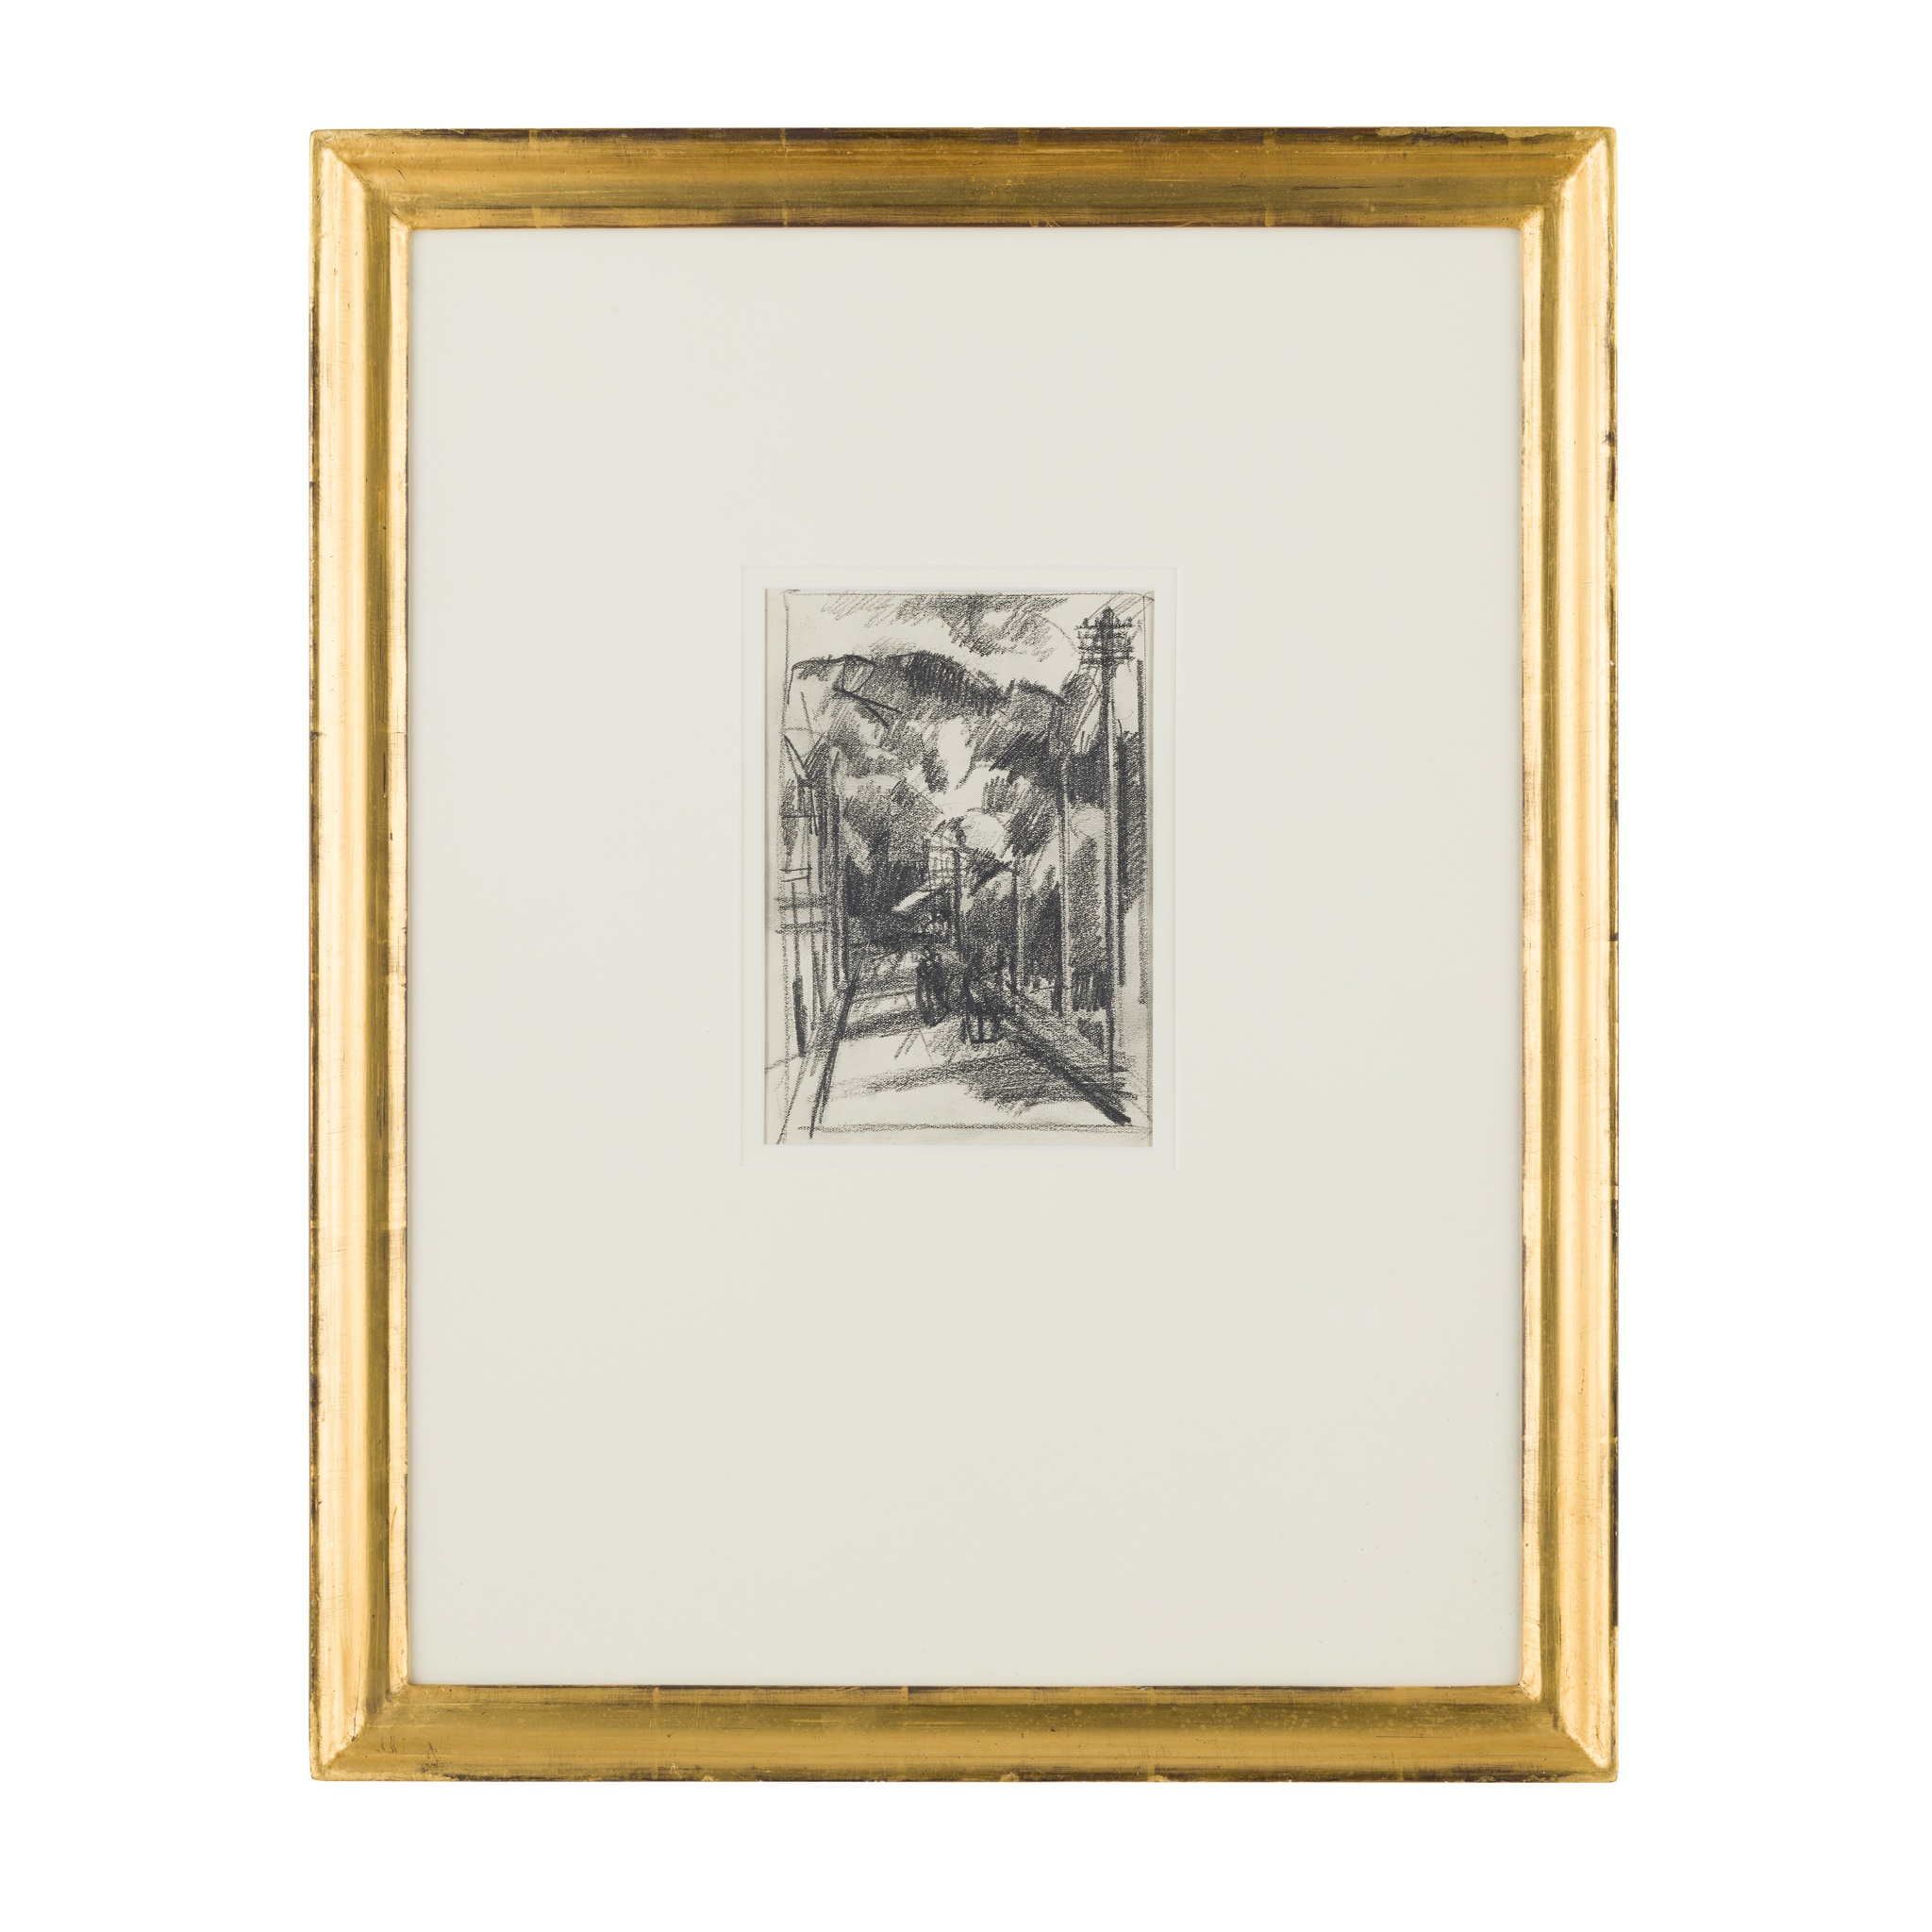 § JOHN DUNCAN FERGUSSON R.B.A. (SCOTTISH 1874-1961) FIGURES PROMENADING HARLECH - Image 2 of 3